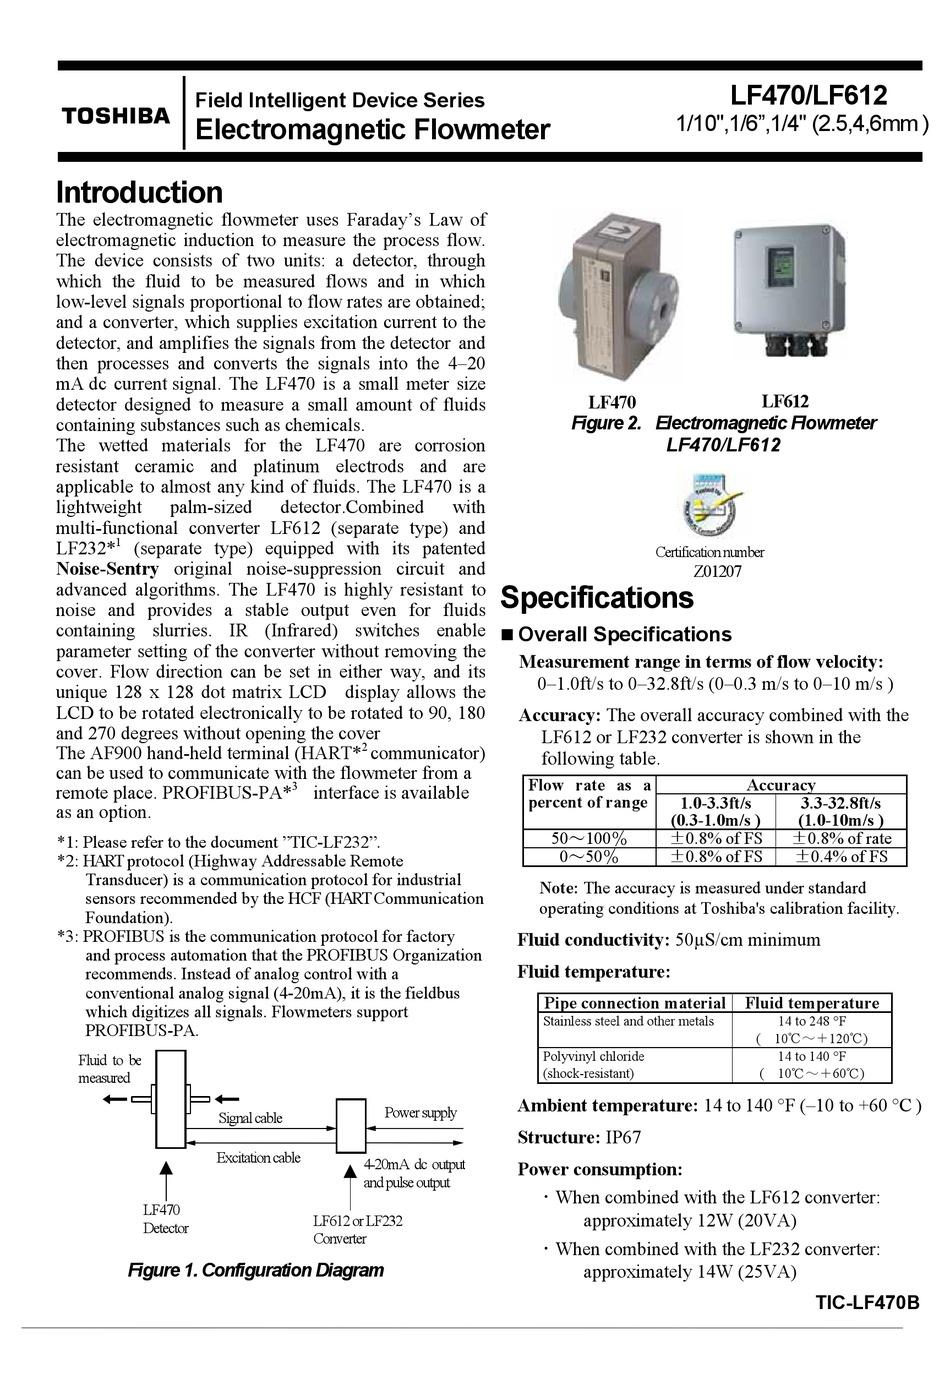 TOSHIBA ELECTROMAGNETIC FLOWMETER LF470/LF612